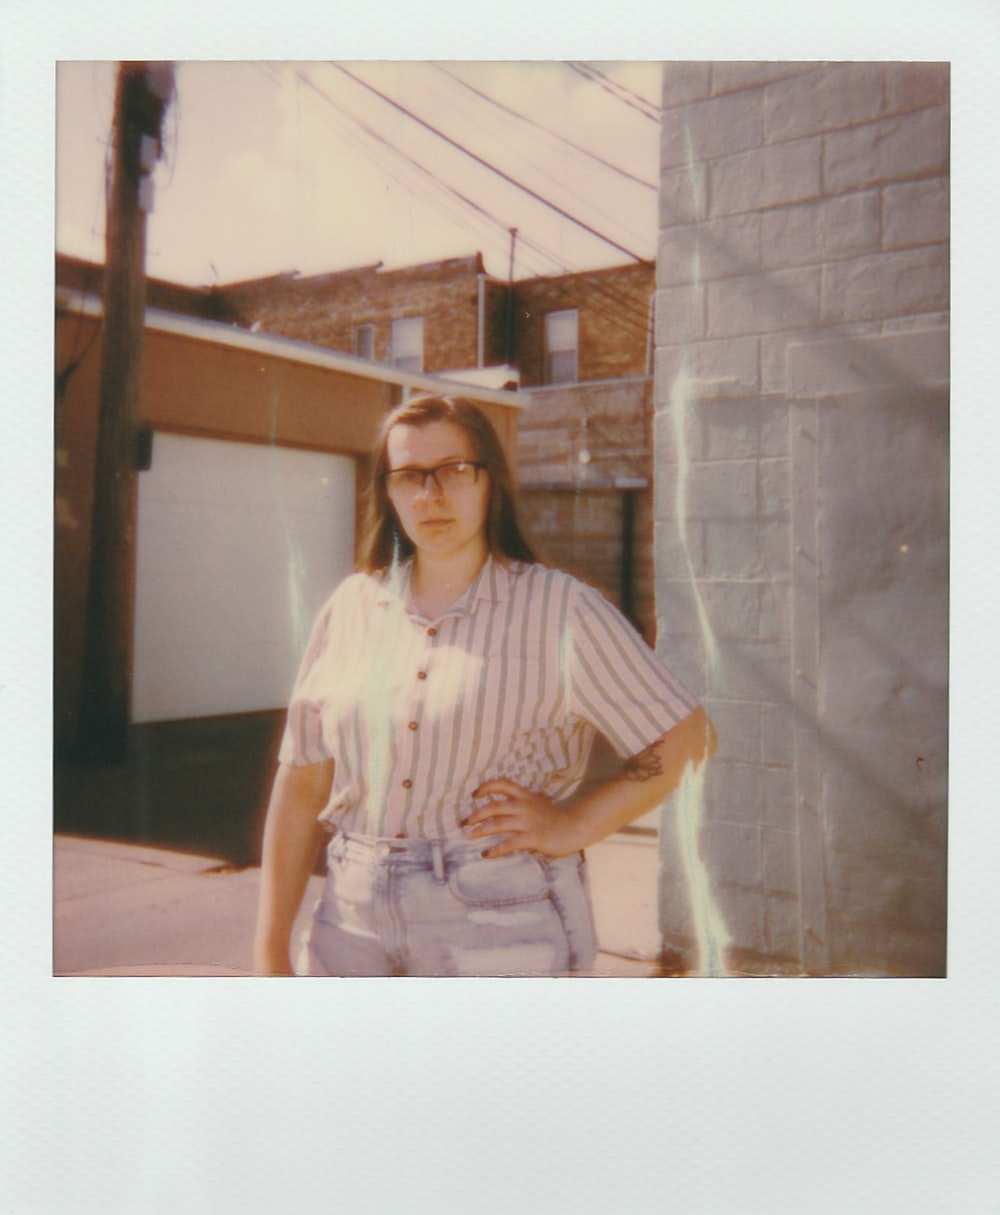 woman wearing striped button-up shirt